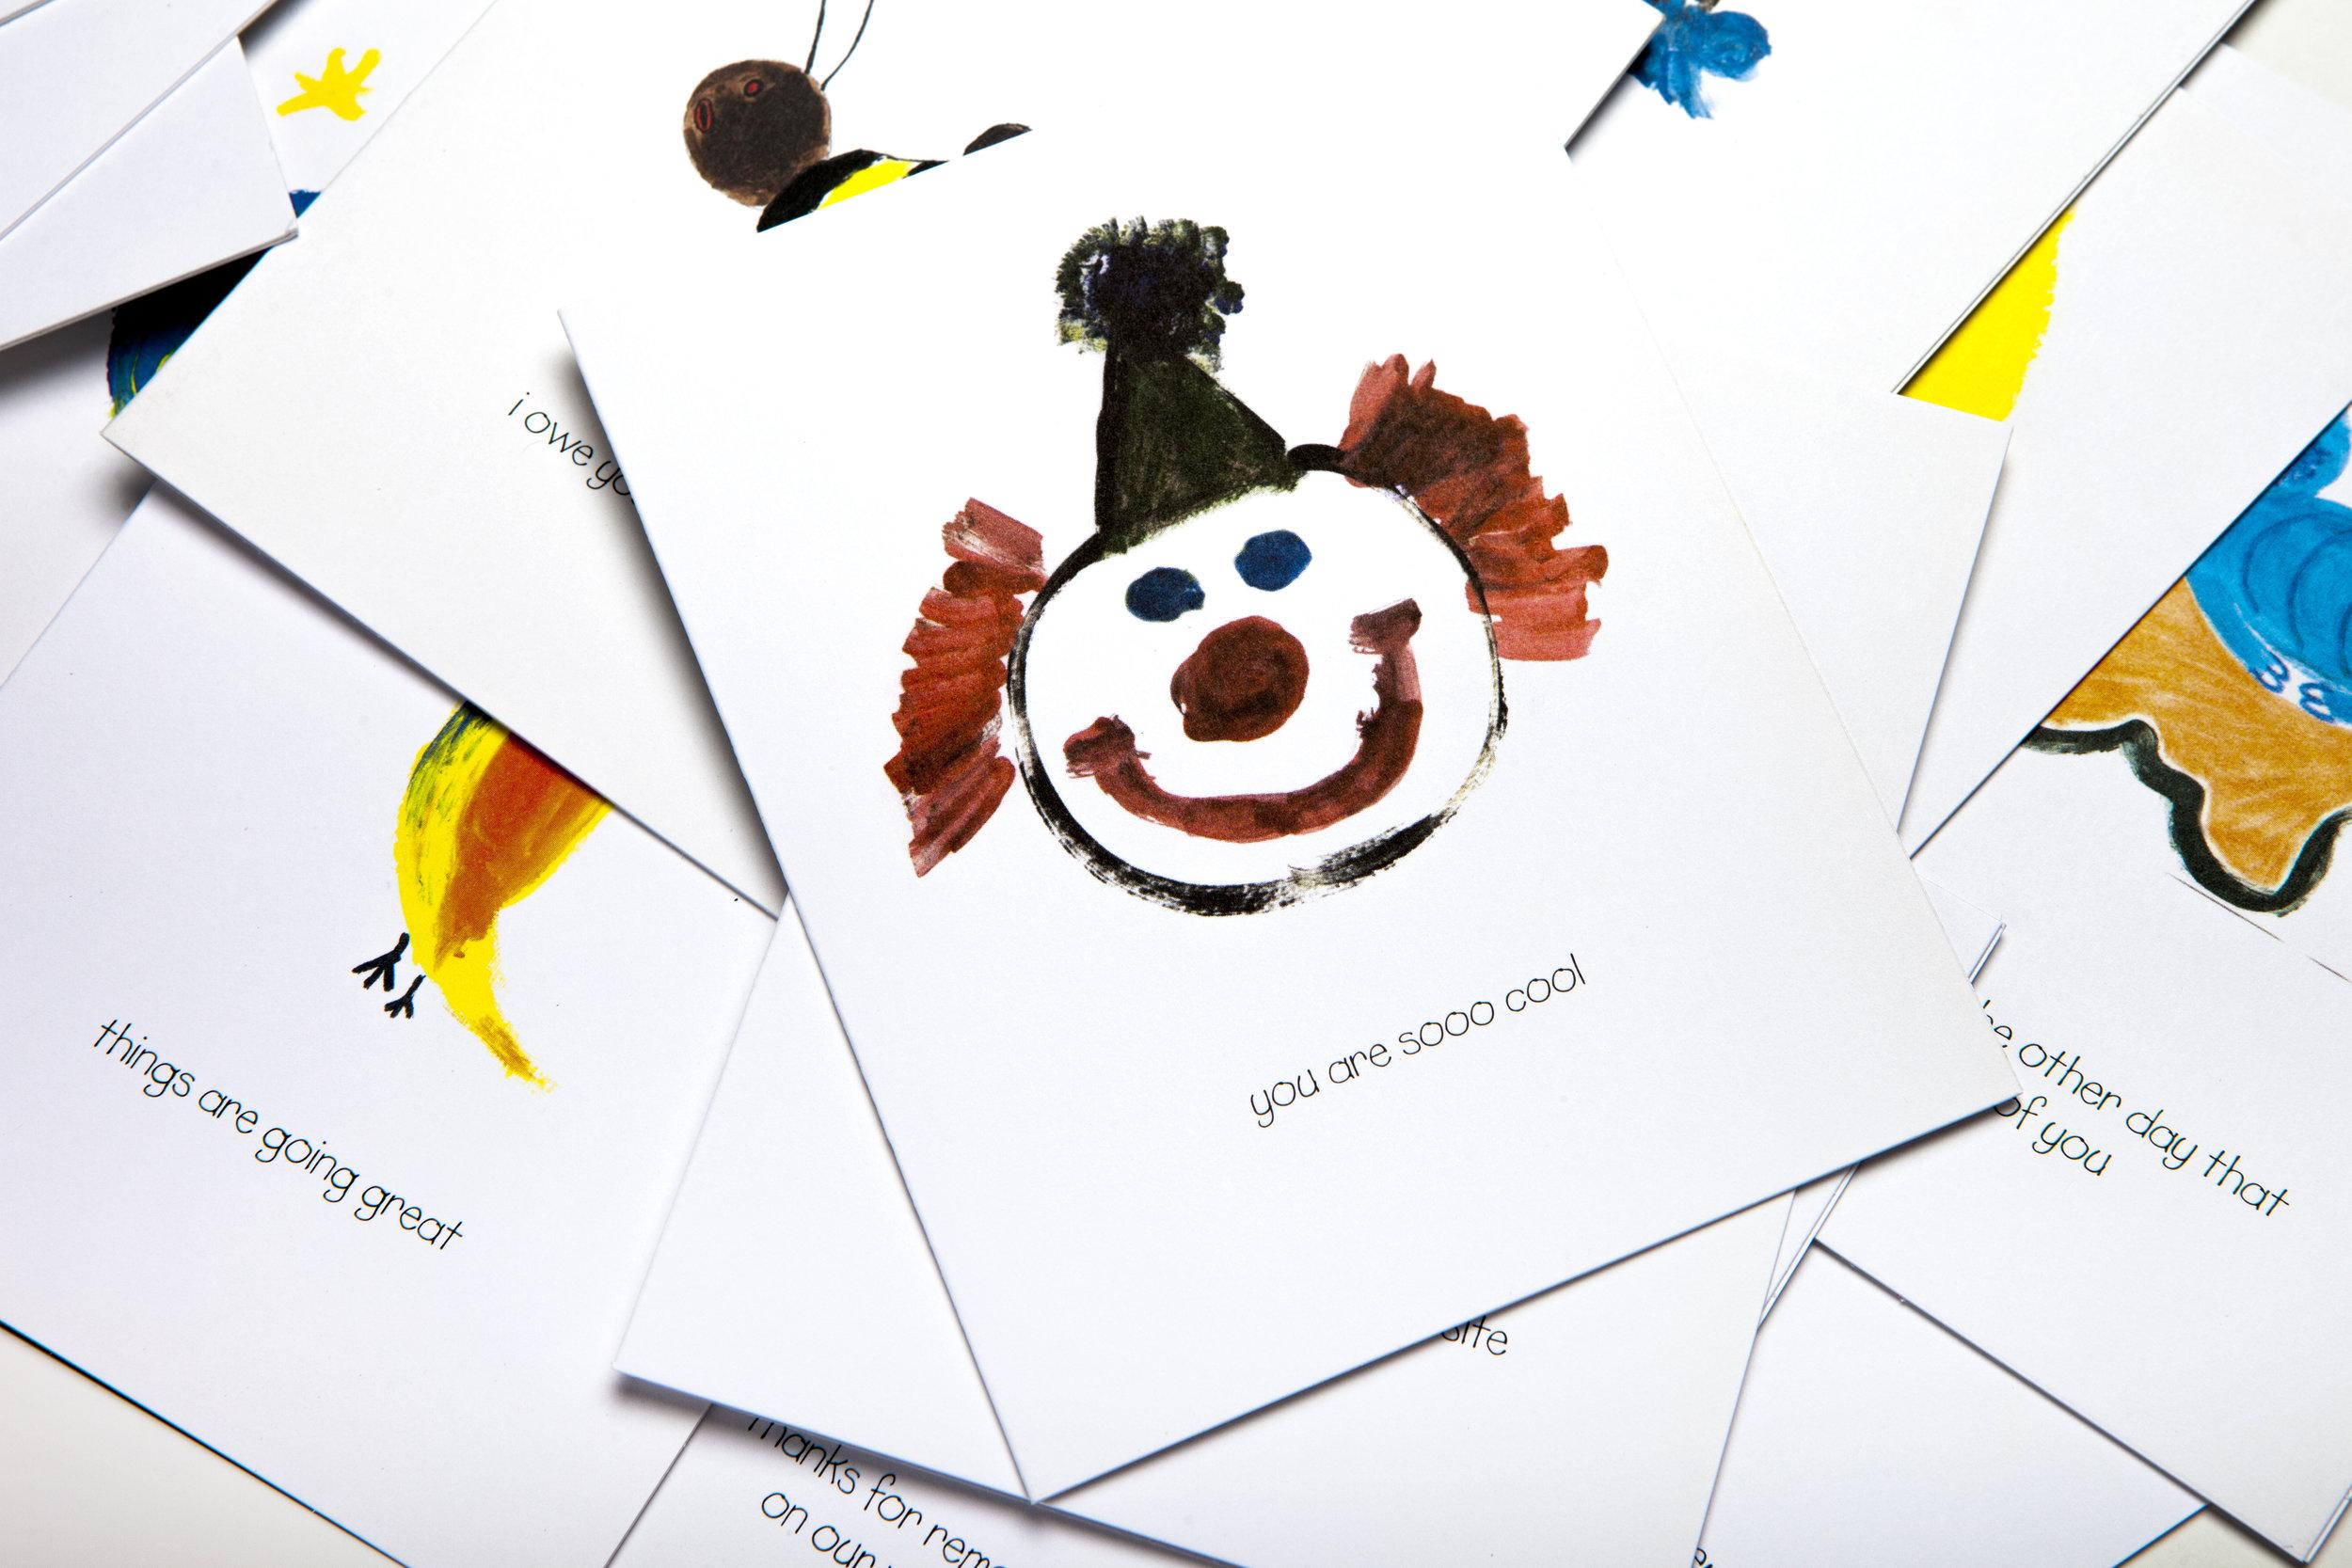 funniest-greeting-cards-ever-keller-kards-greeting-cards.jpg